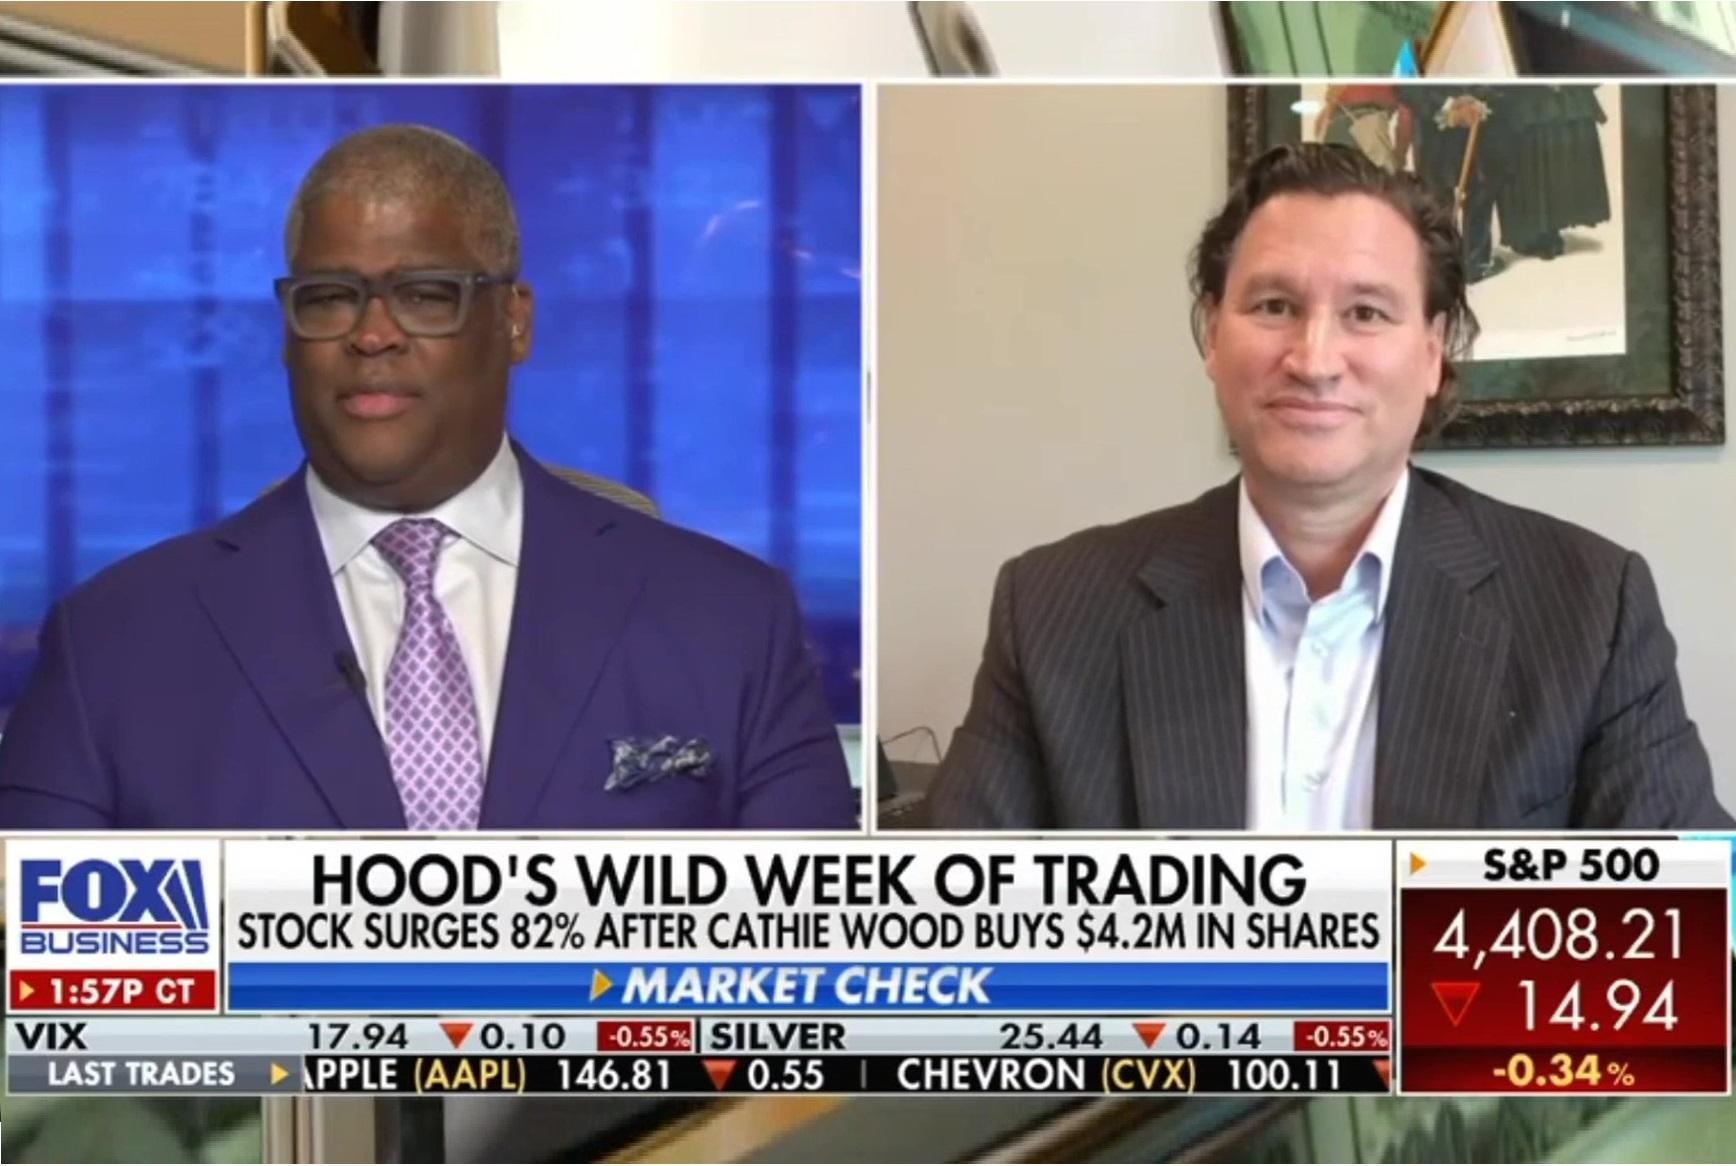 Hood's Wild Week of Trading